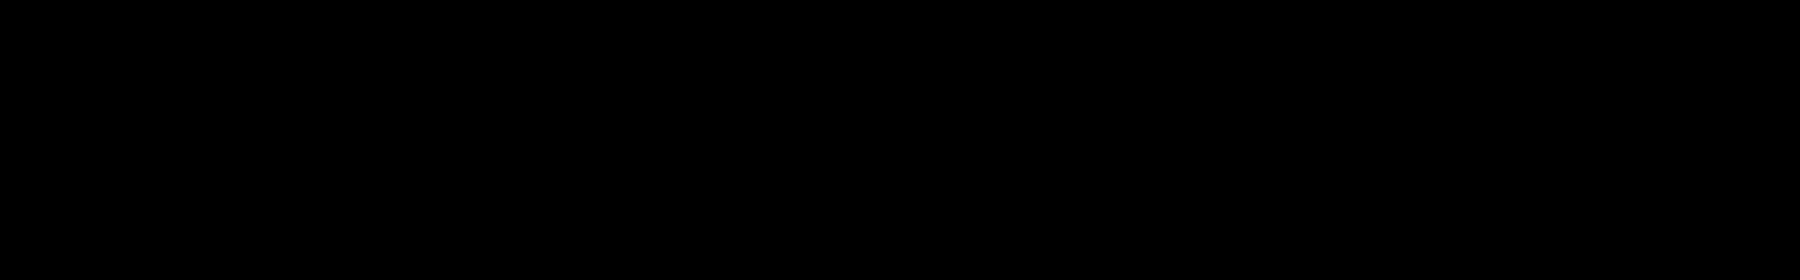 Elements audio waveform